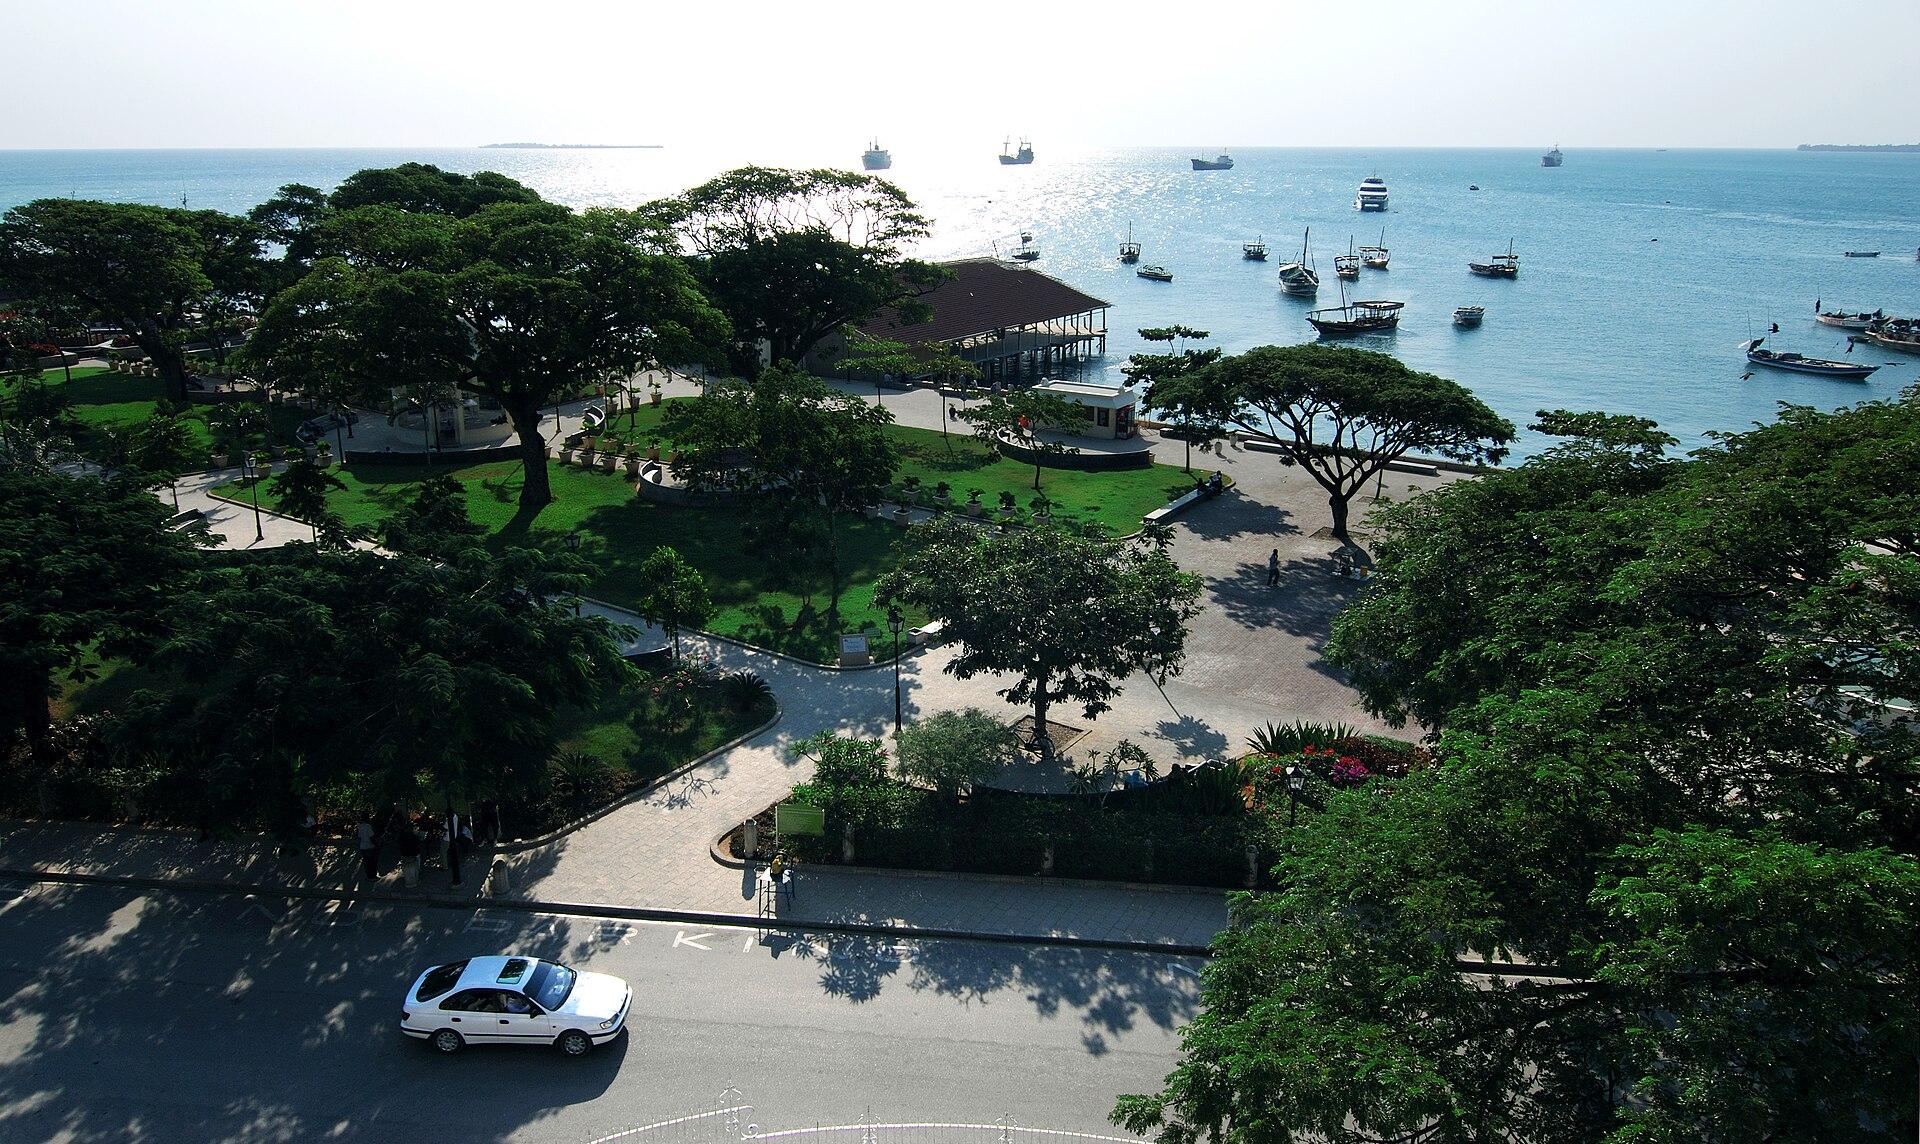 The Forodhani (harbour) Gardens in Stone Town, Zanzibar